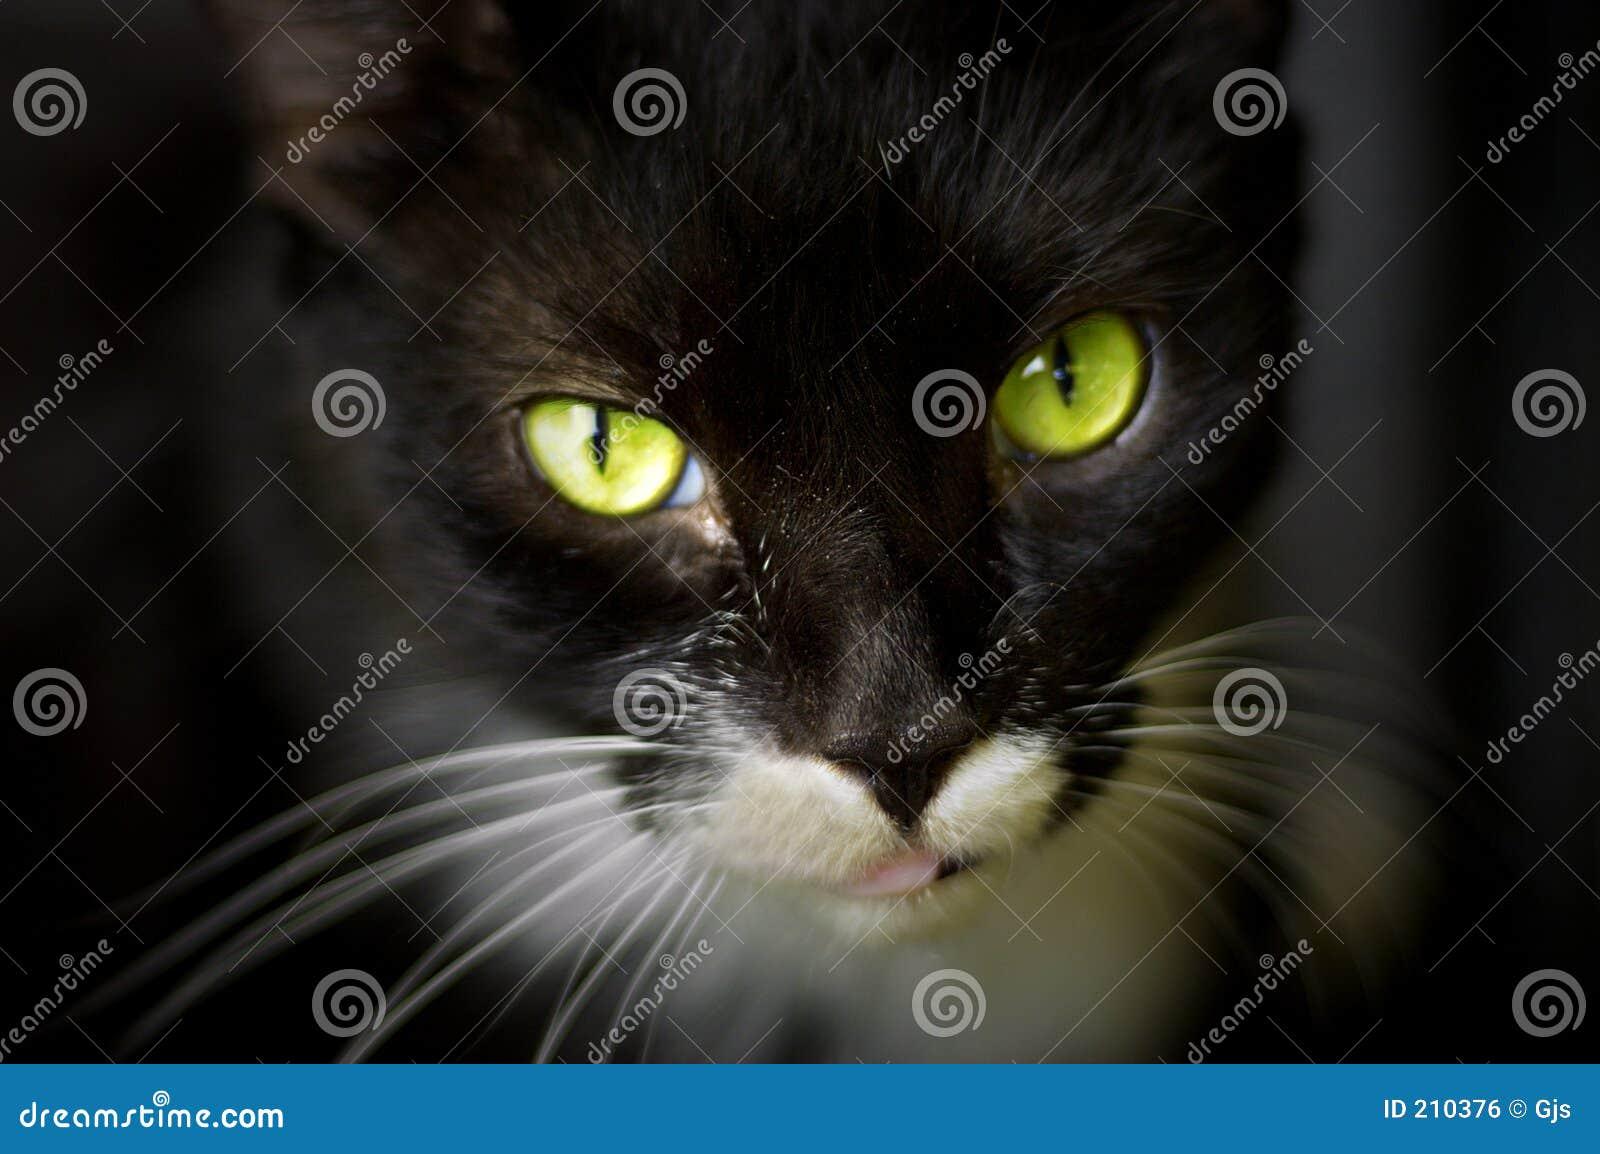 Katten eyes ursnygg green